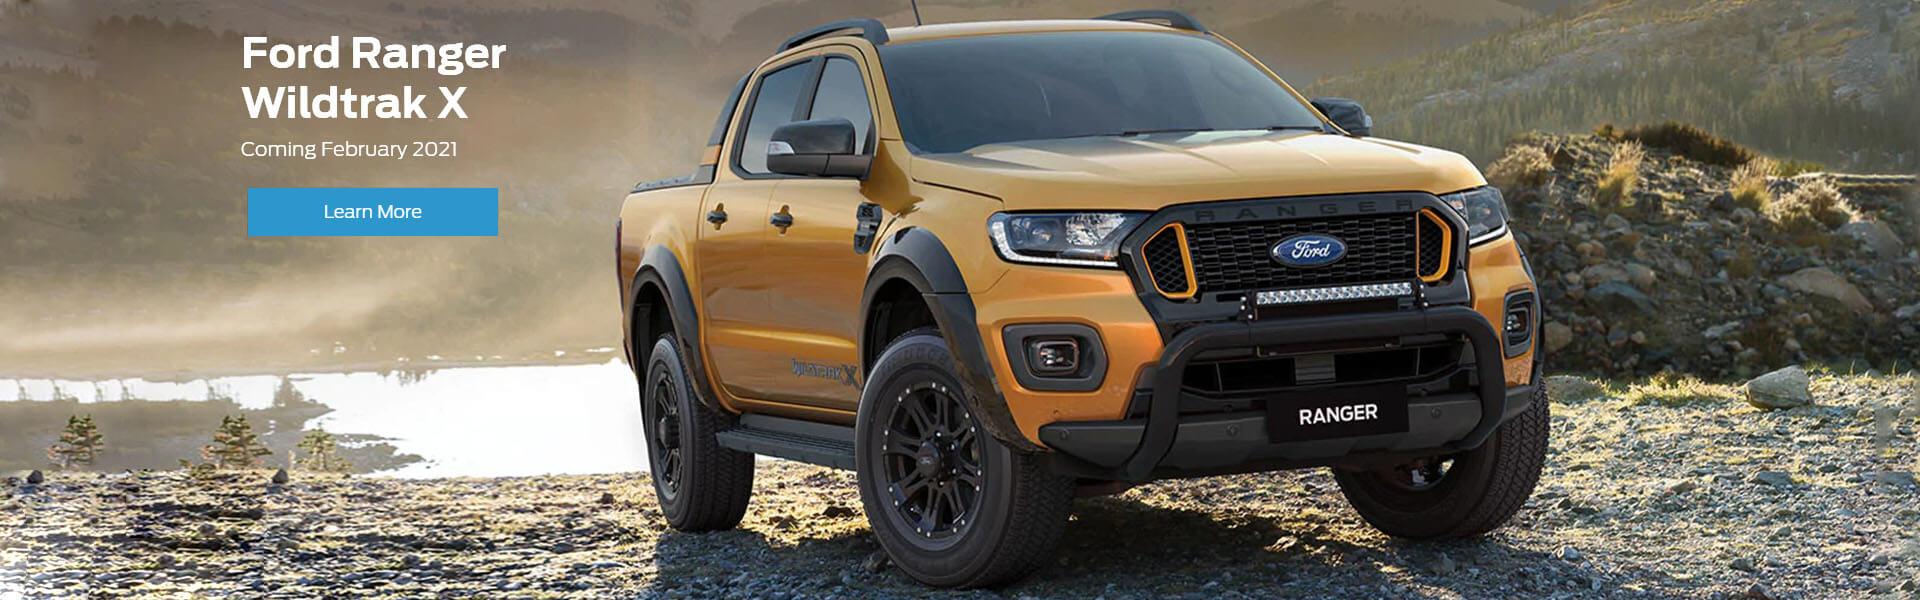 Ford Ranger Wildtrak X - Coming February 2021